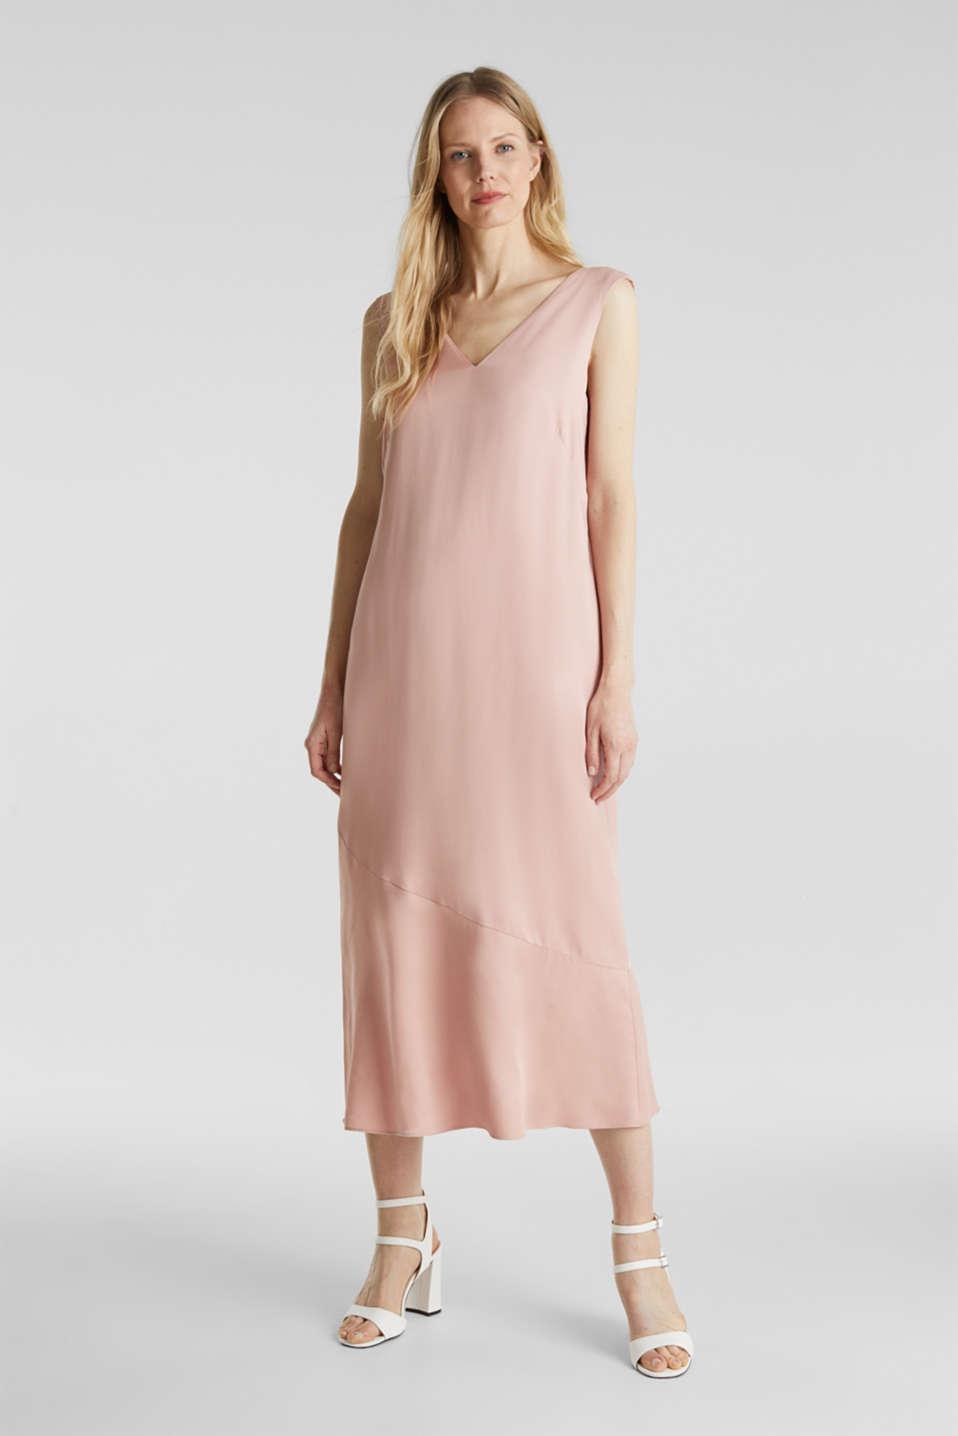 Satin dress with a flounce hem, NUDE, detail image number 0